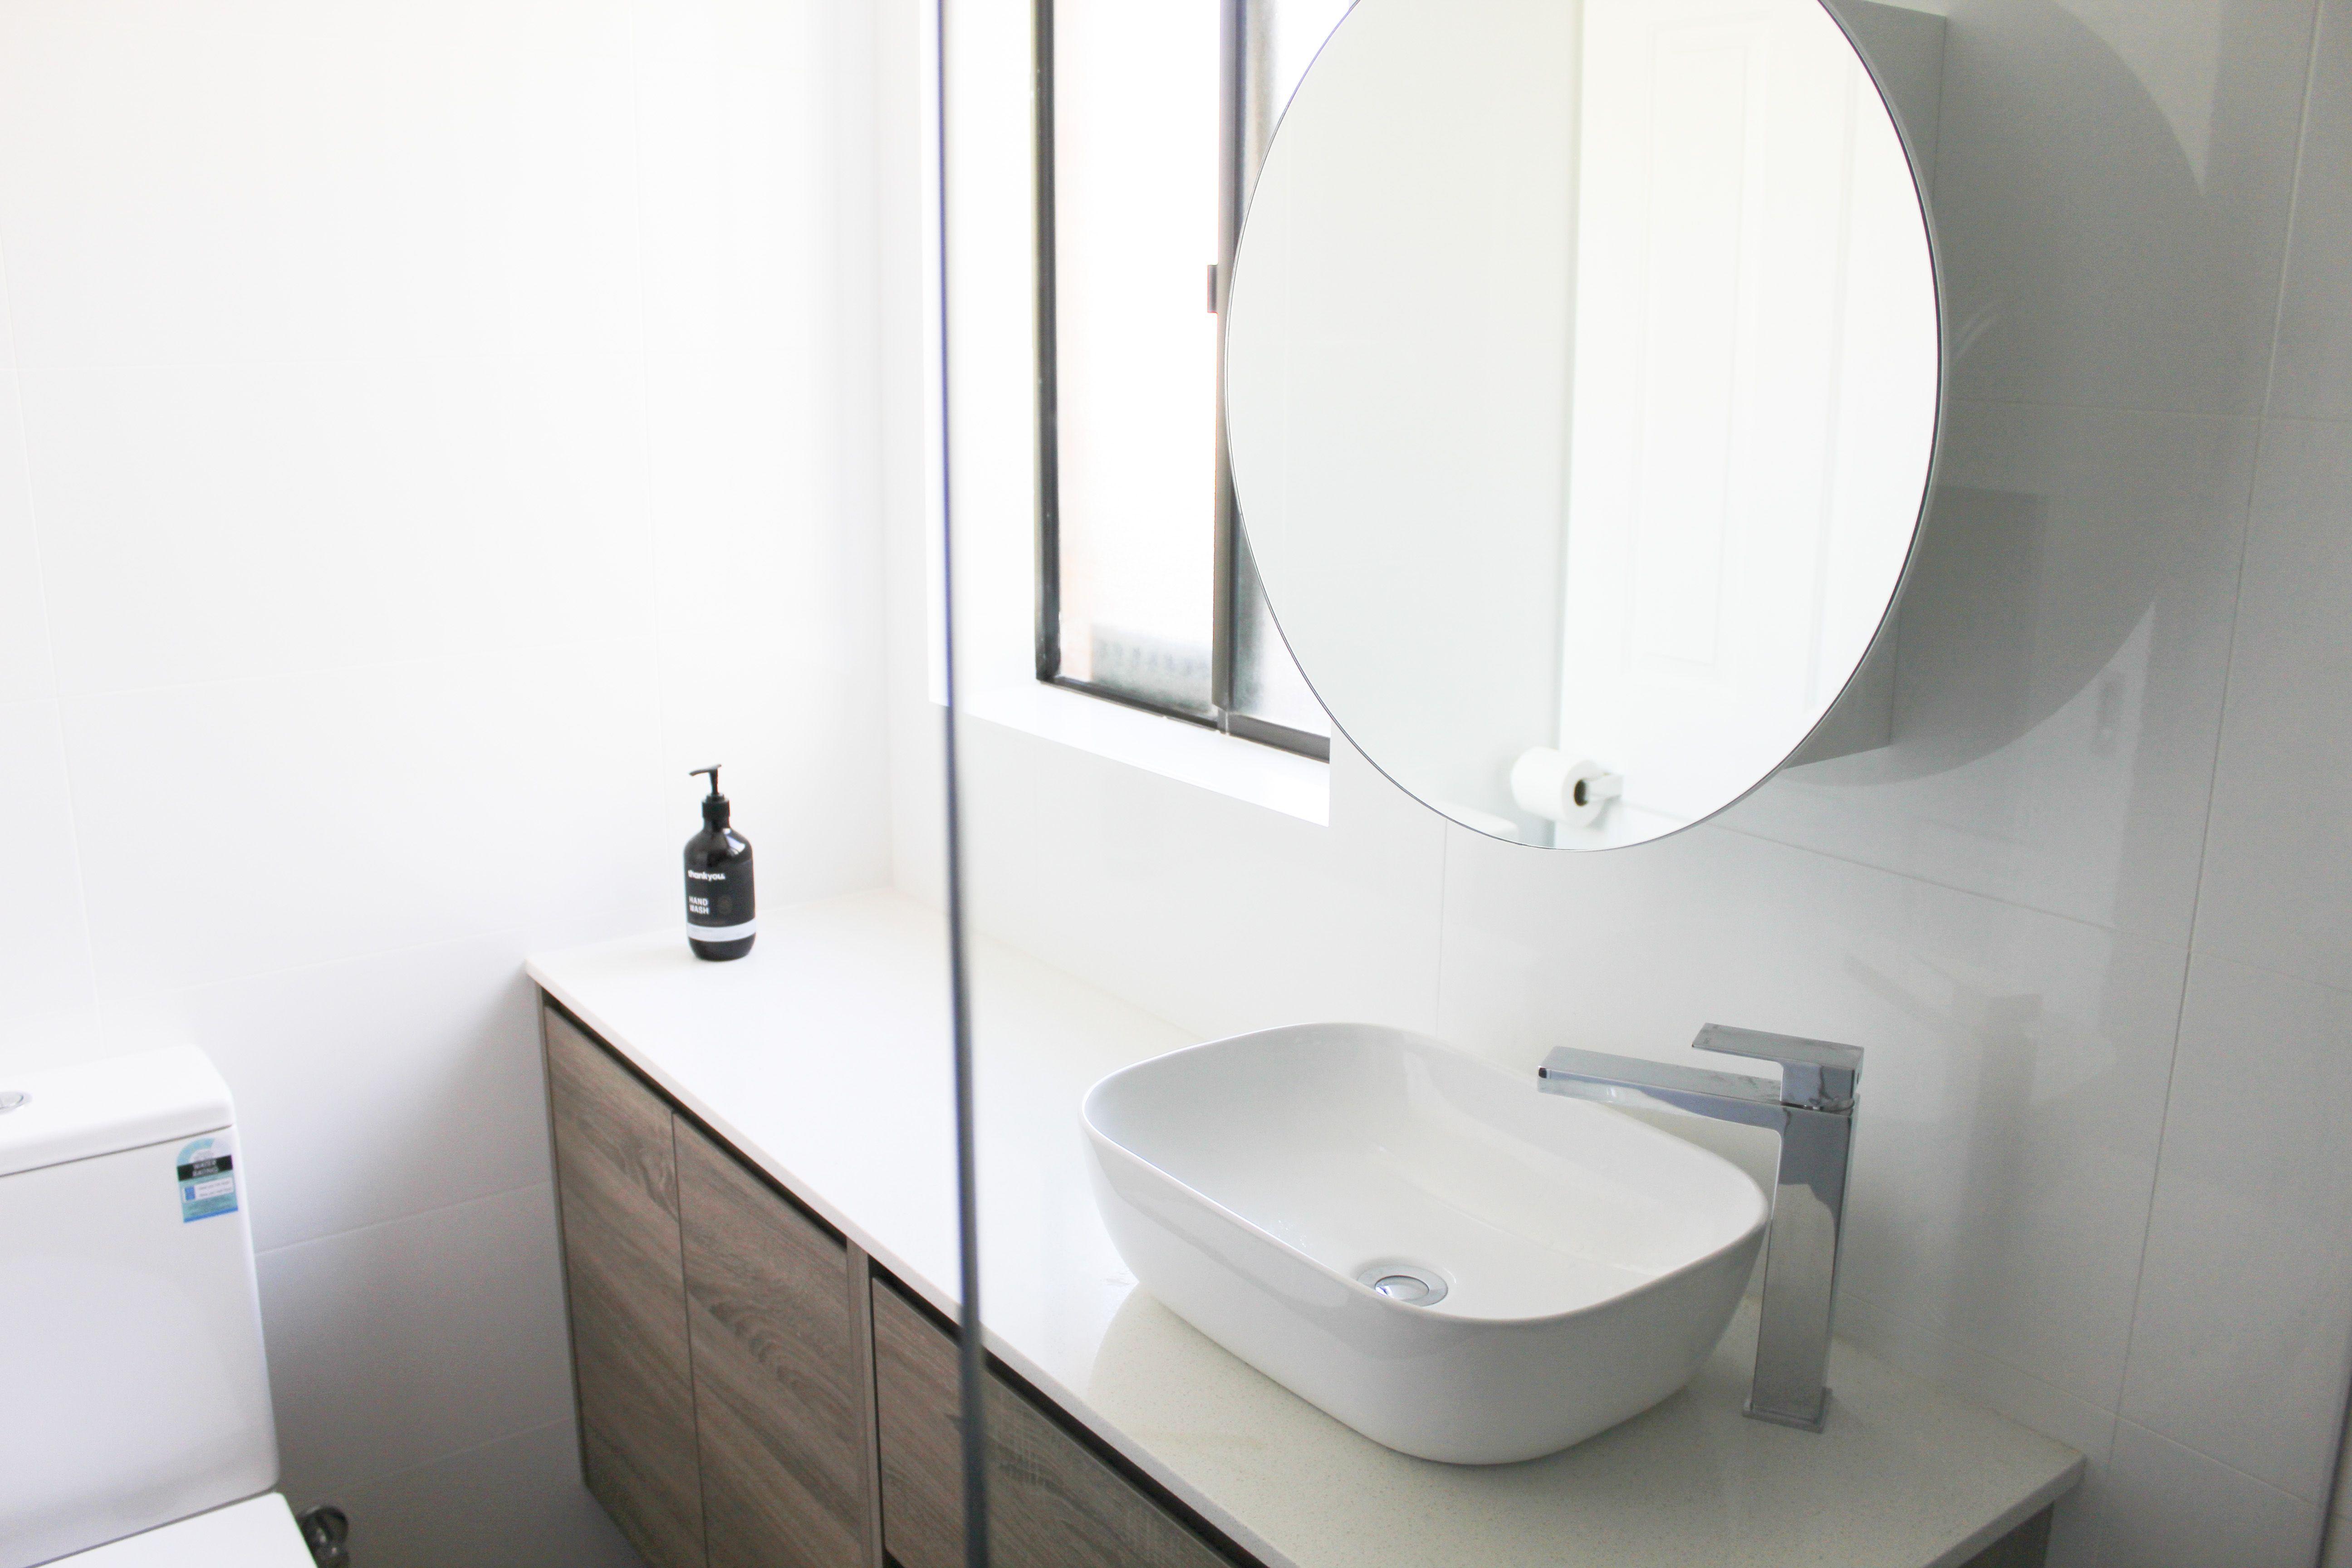 Round Mirror Cabinet | Mirror cabinets, Round mirror ...